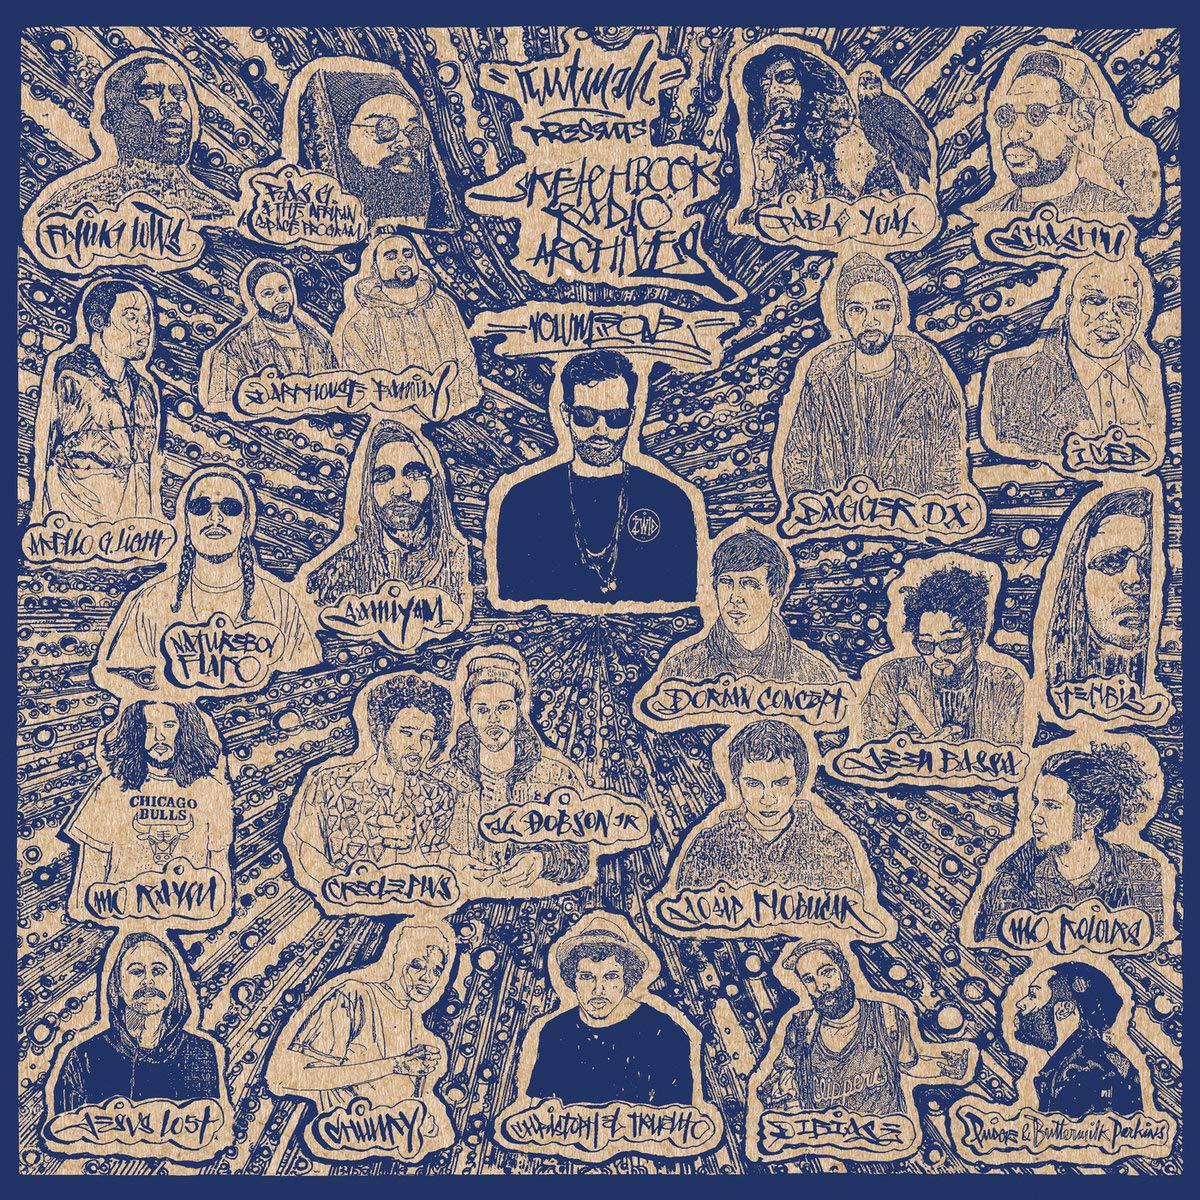 Kutmah Presents - Sketchbook Radio Archives Vol. 1